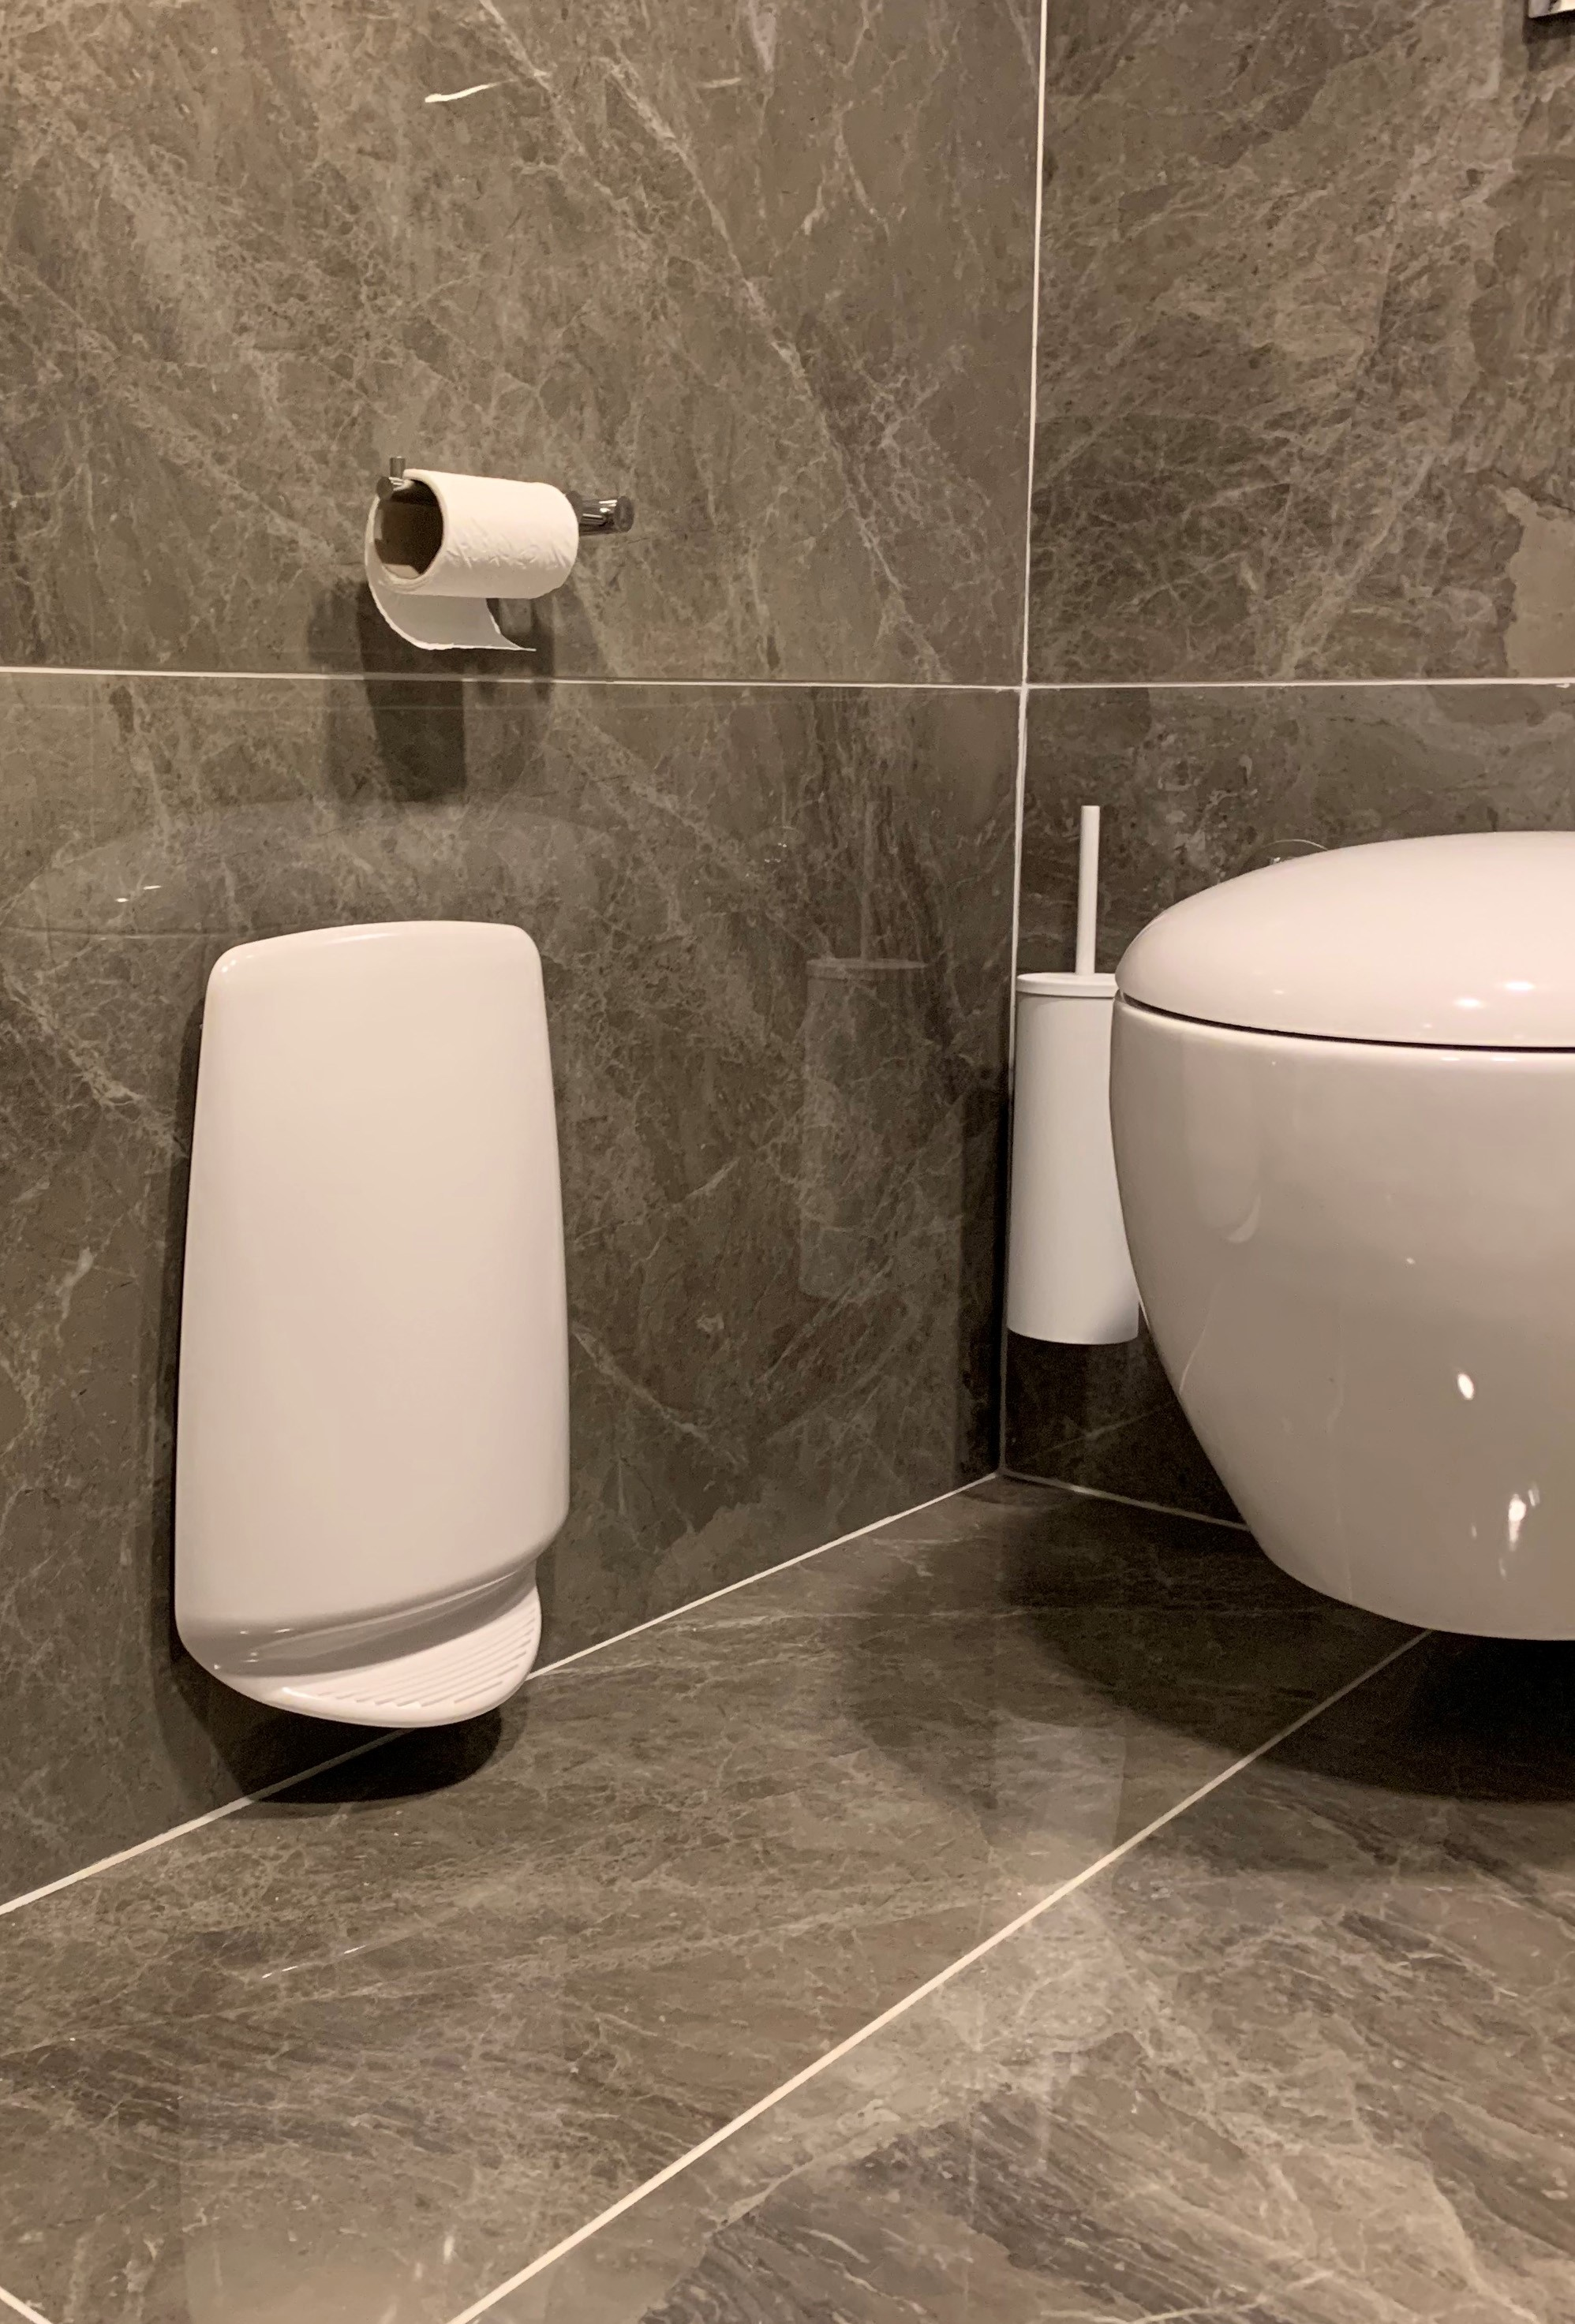 toilet, toiletvedhæng, hygiejne. (Foto: Unsplash)